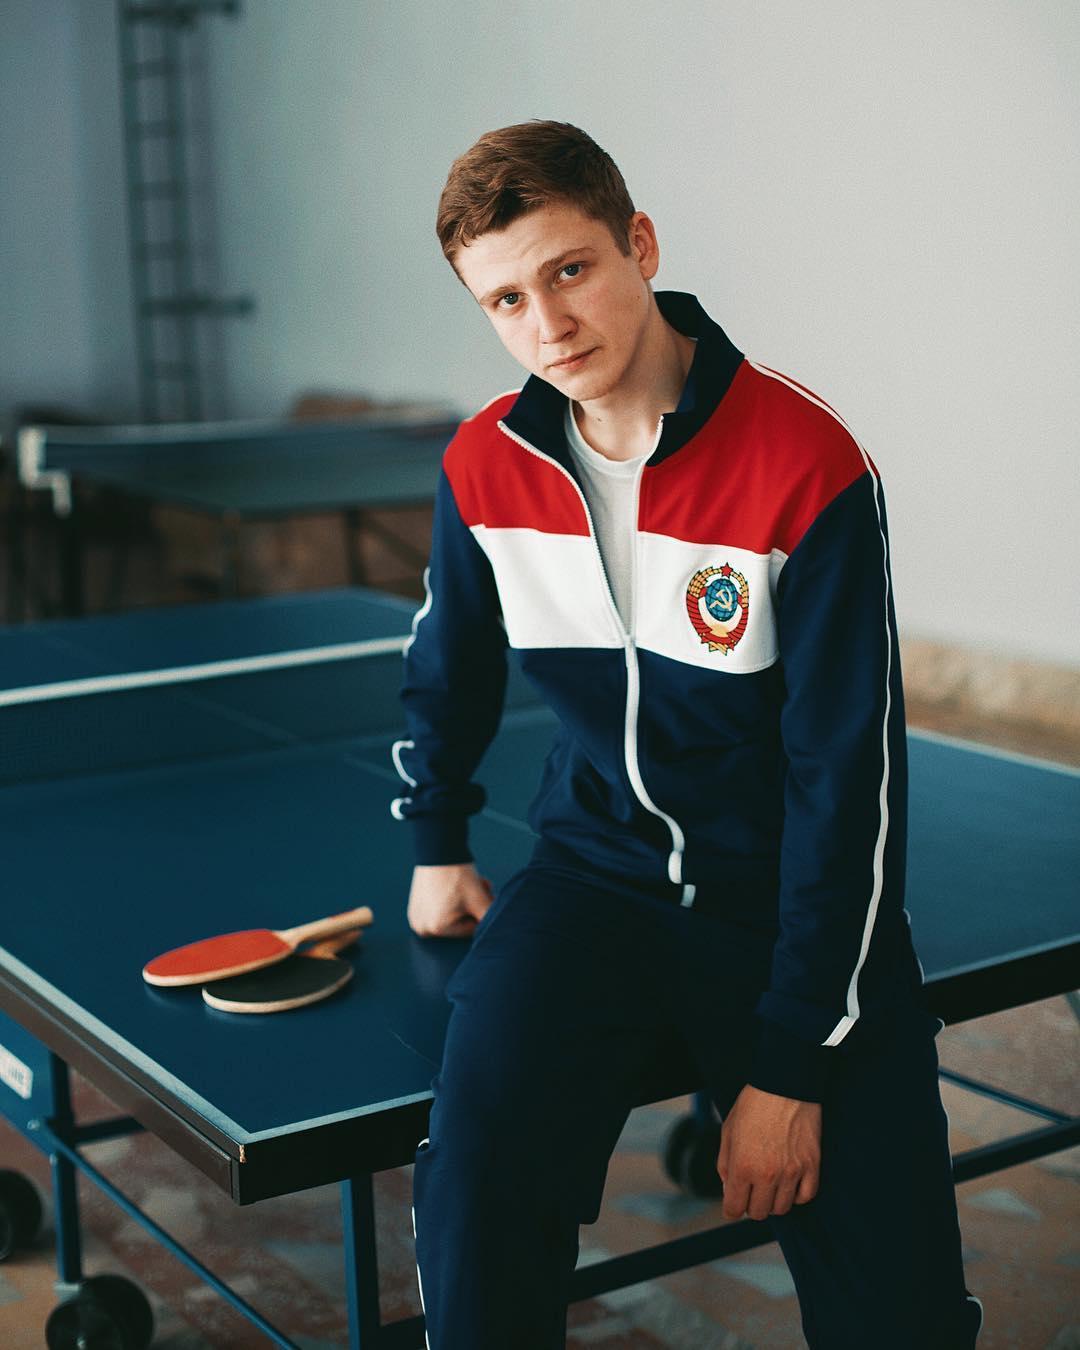 yelistratovv Русич Спорт